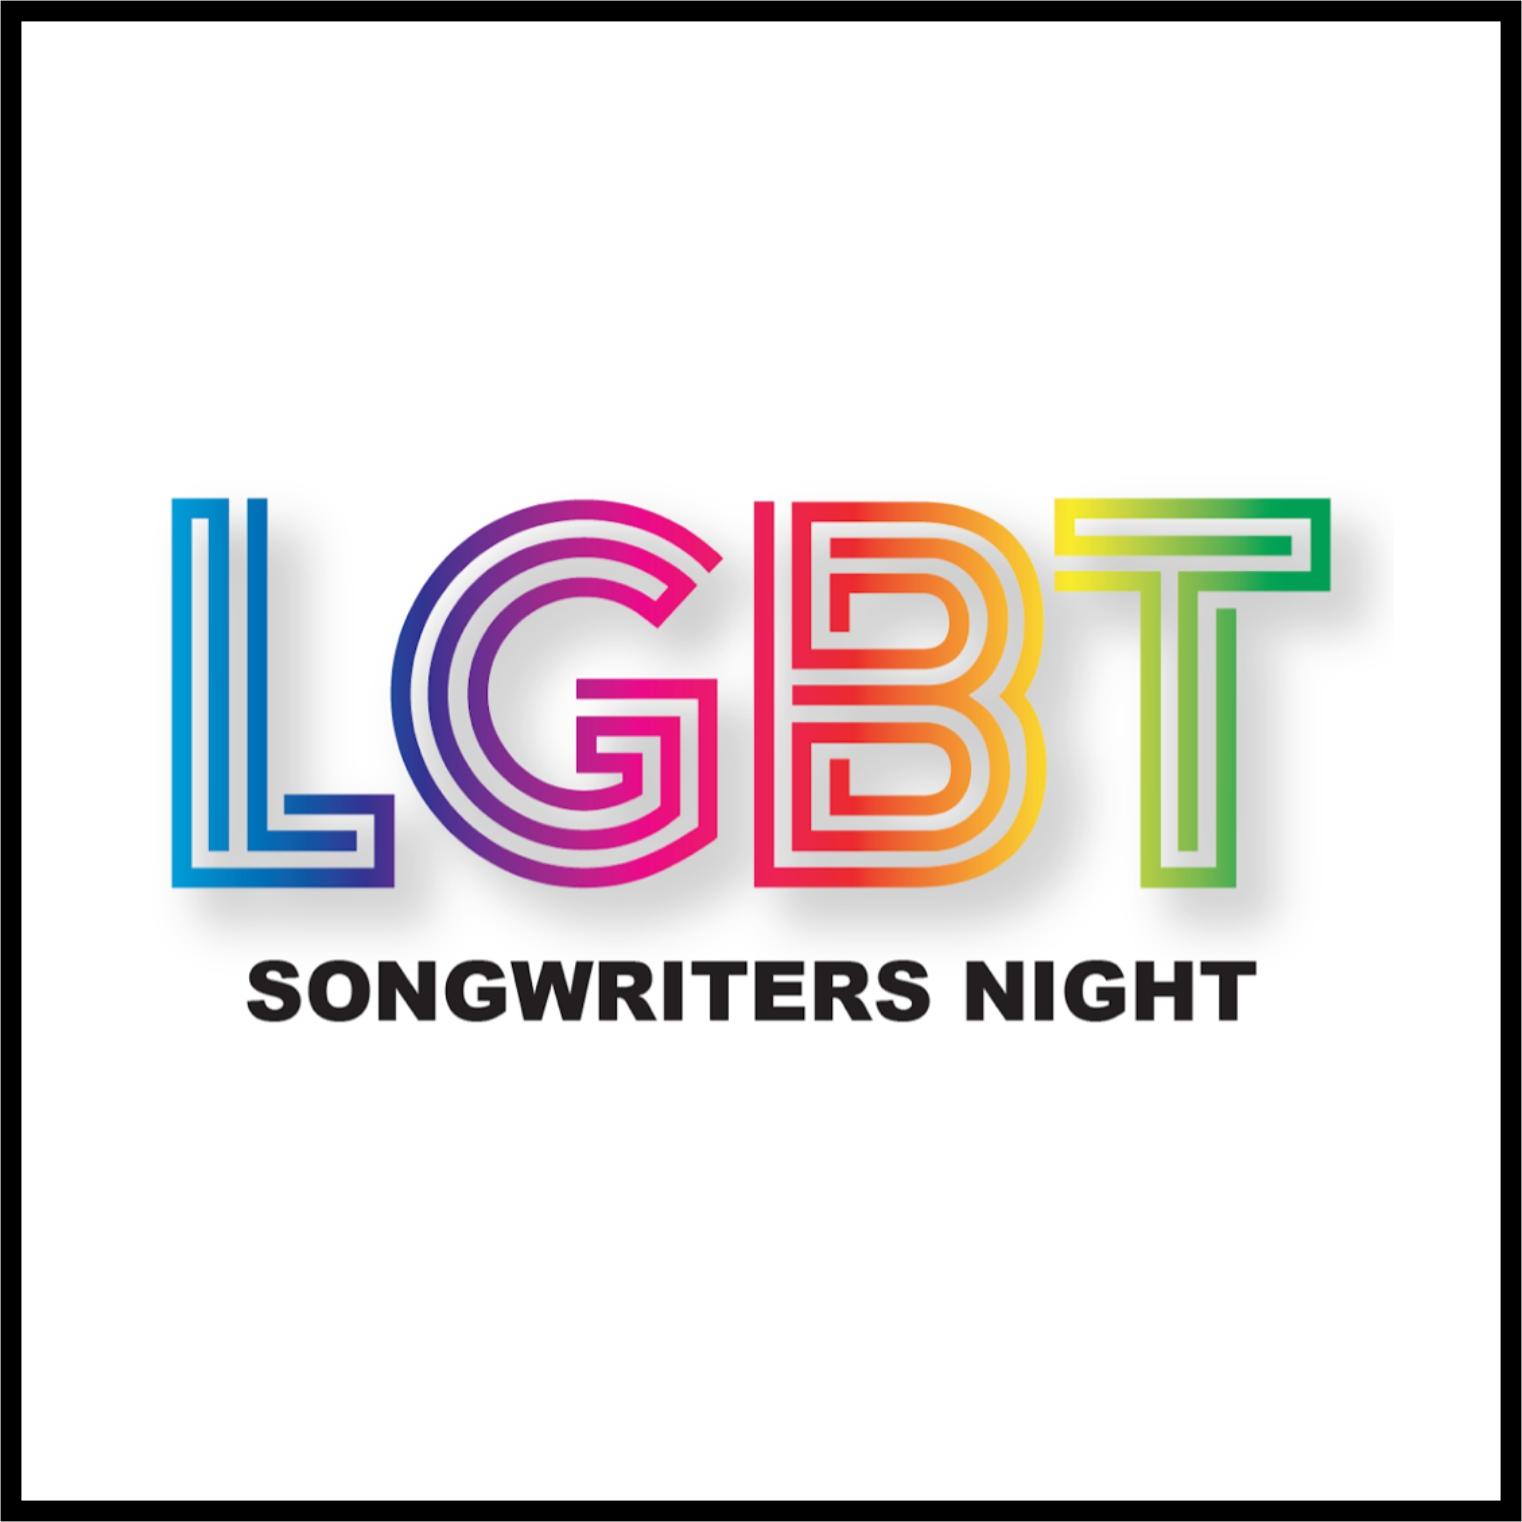 Brian Falduto's LGBT Songwriters Night.jpg